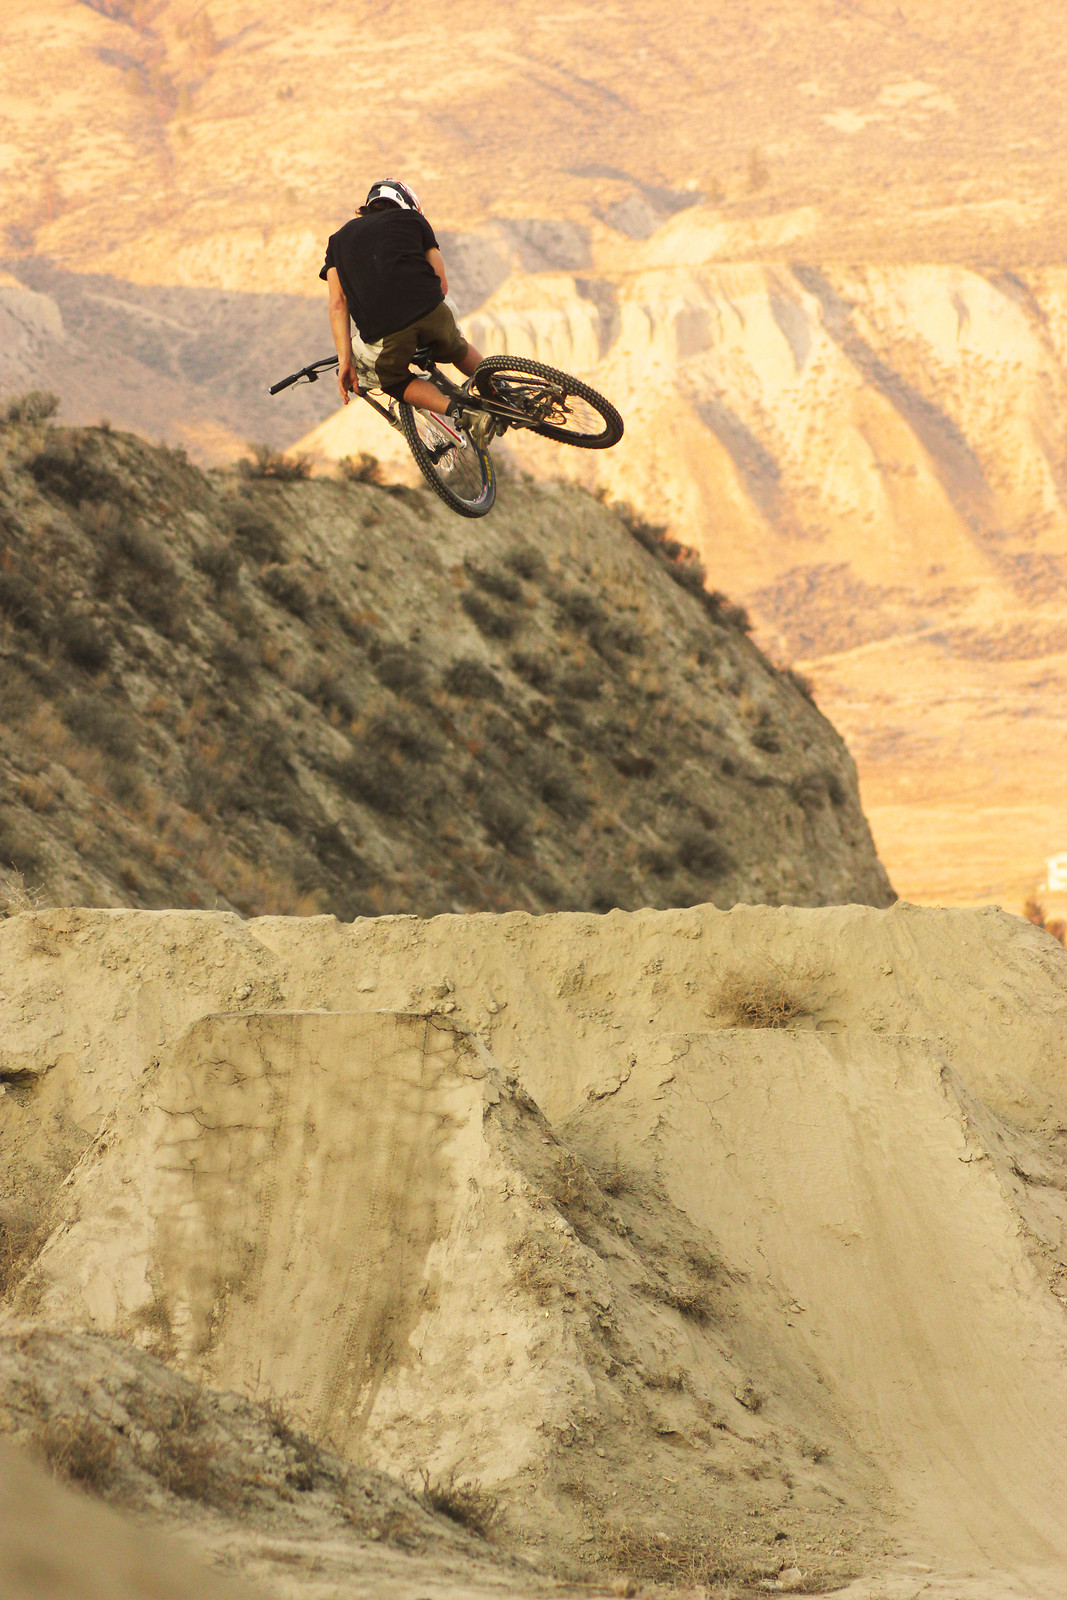 Mike Steeze - kmak - Mountain Biking Pictures - Vital MTB